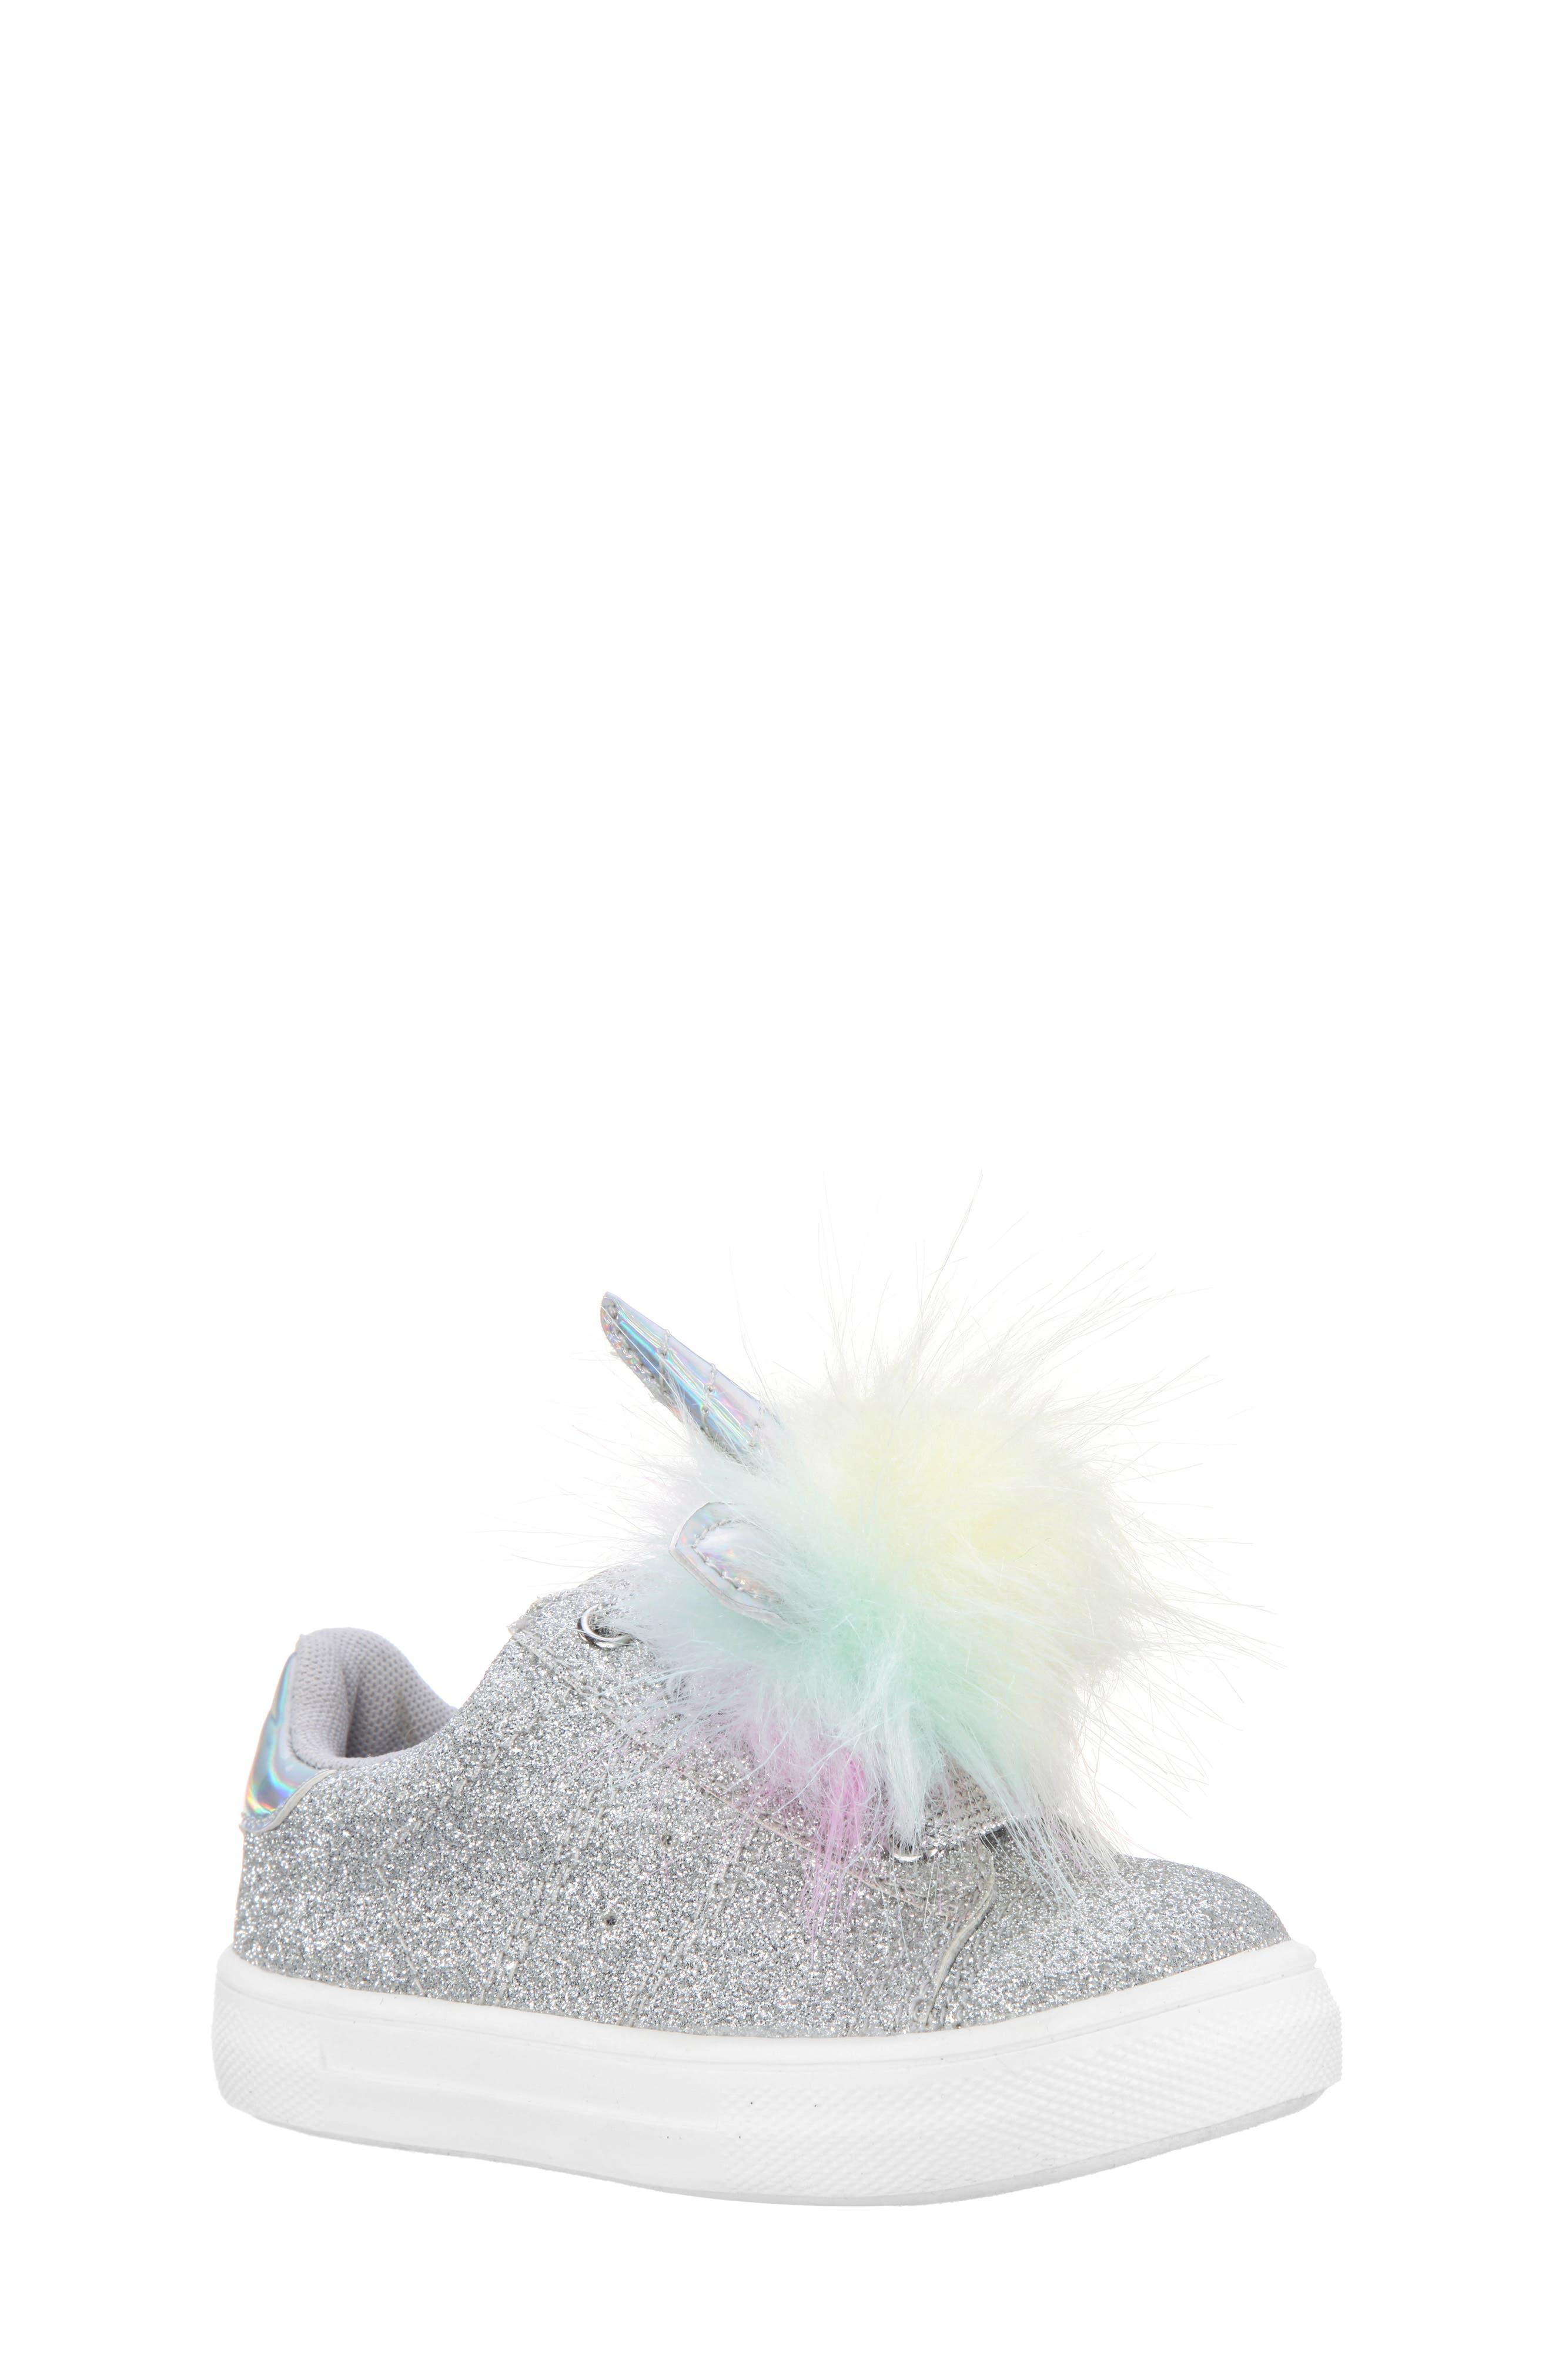 Toddler Girls Nina Britteni Animal Pompom Glitter Sneaker Size 9 M  Metallic